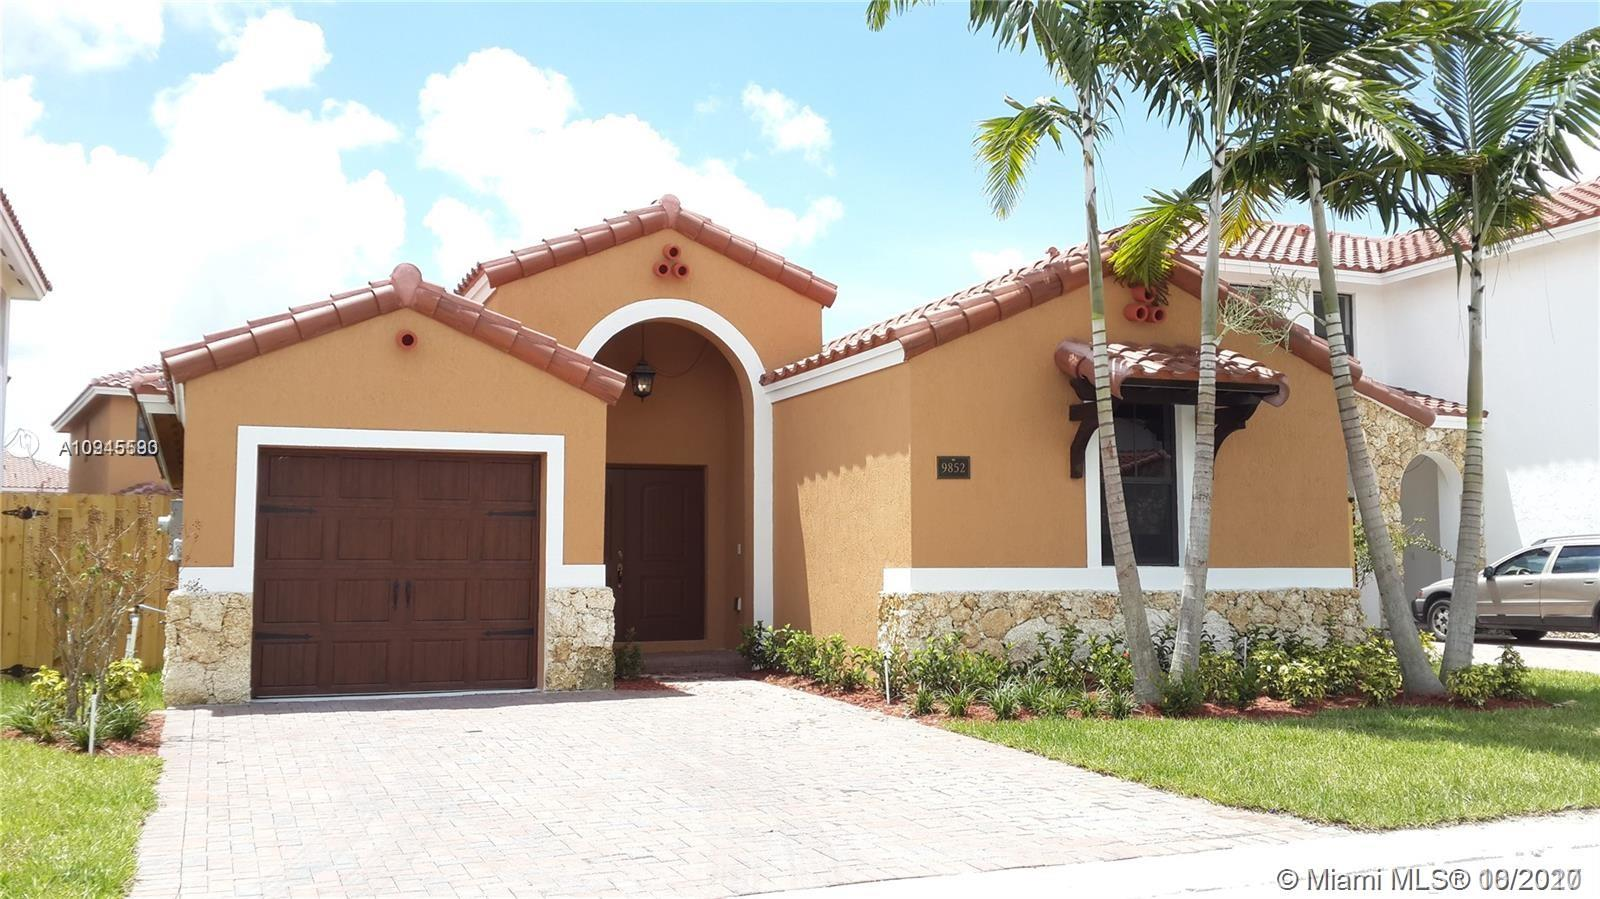 Las Ramblas - 9852 NW 10 TER, Miami, FL 33172